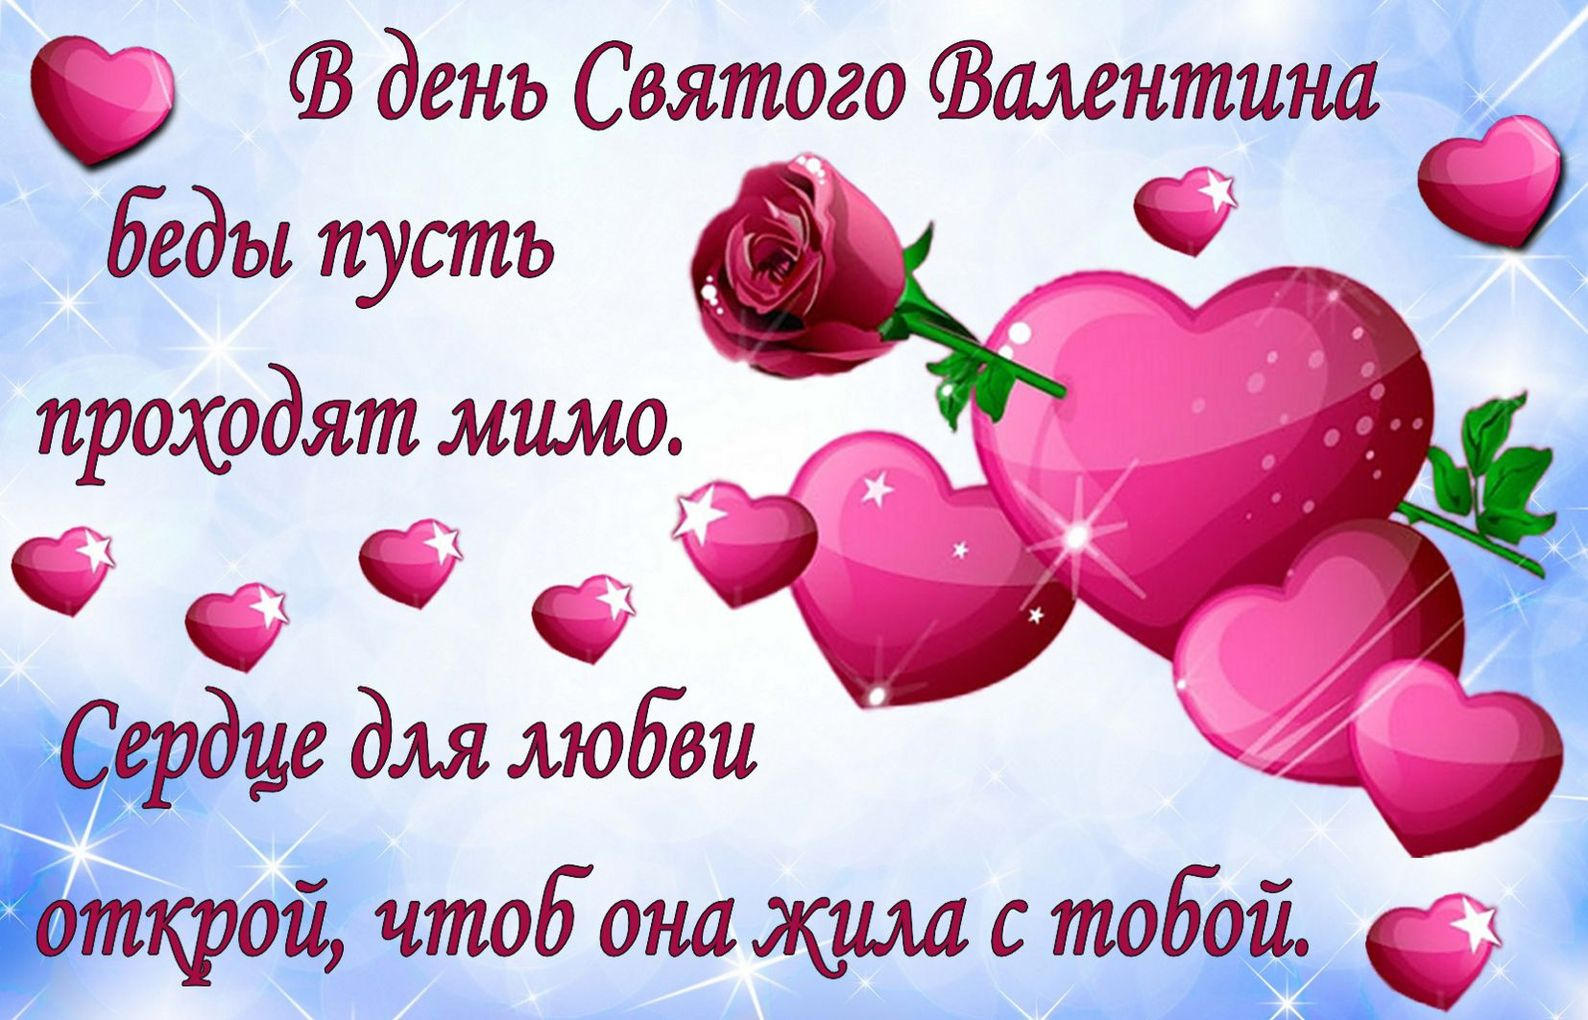 С днем святого валентина картинки любимой анечке